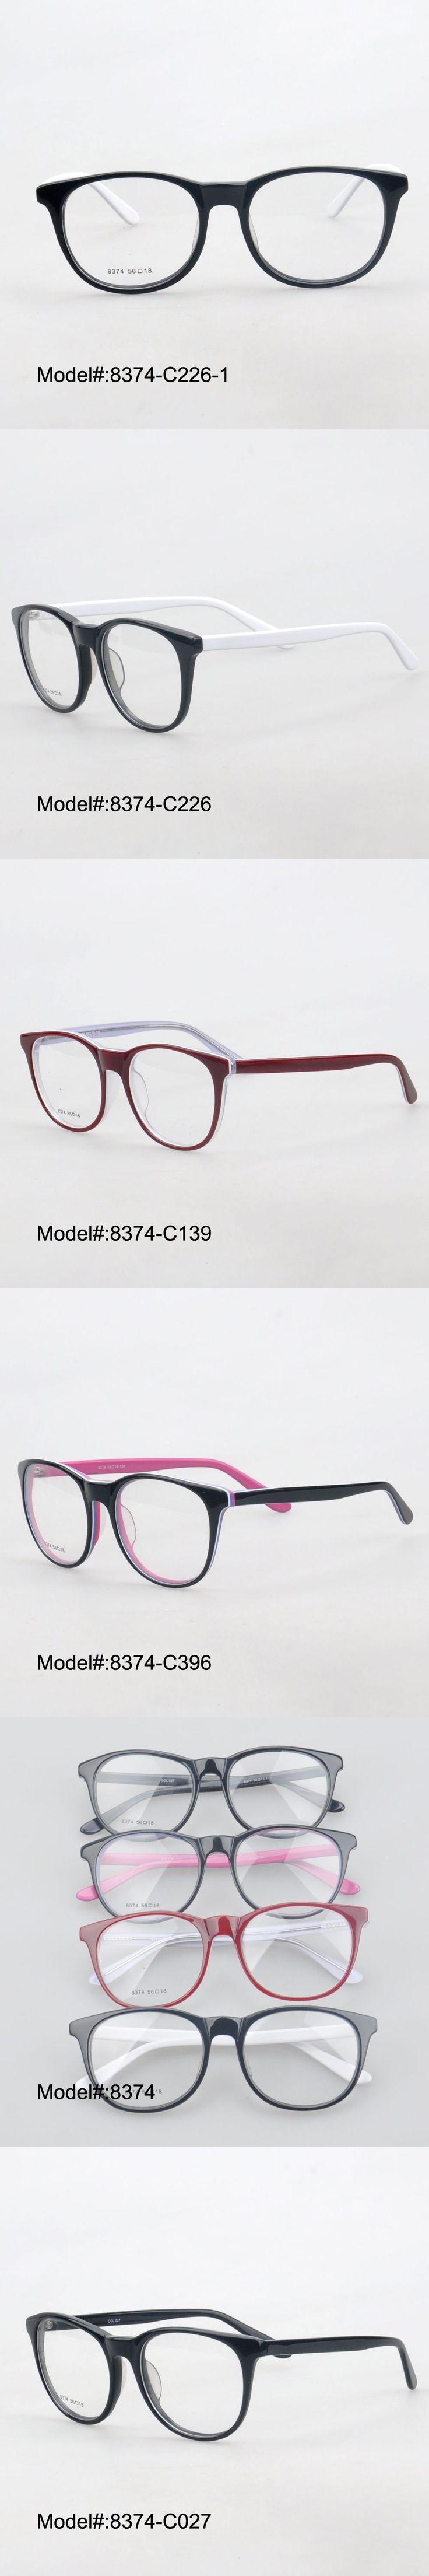 MY DOLI big sale 8374 high quality full rim acetate optical for unisex myopia prescription optical frame eyeglasses spectacles